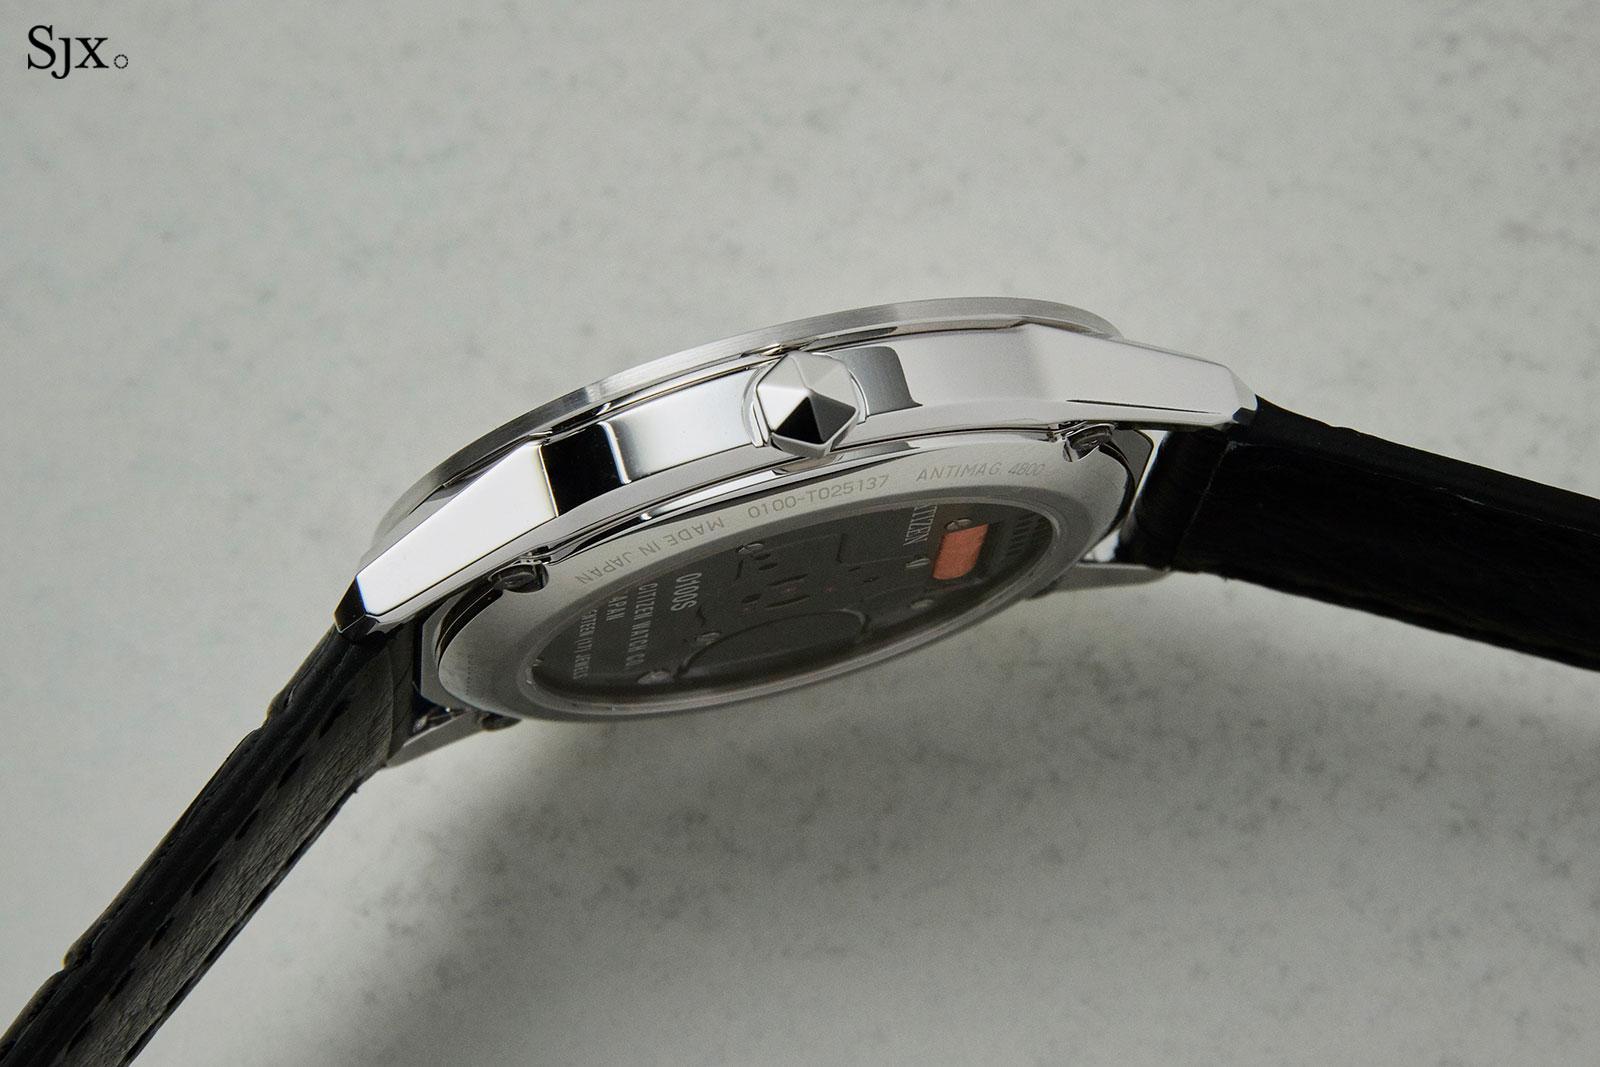 Citizen Caliber 0100 white gold AQ6010-06A-4